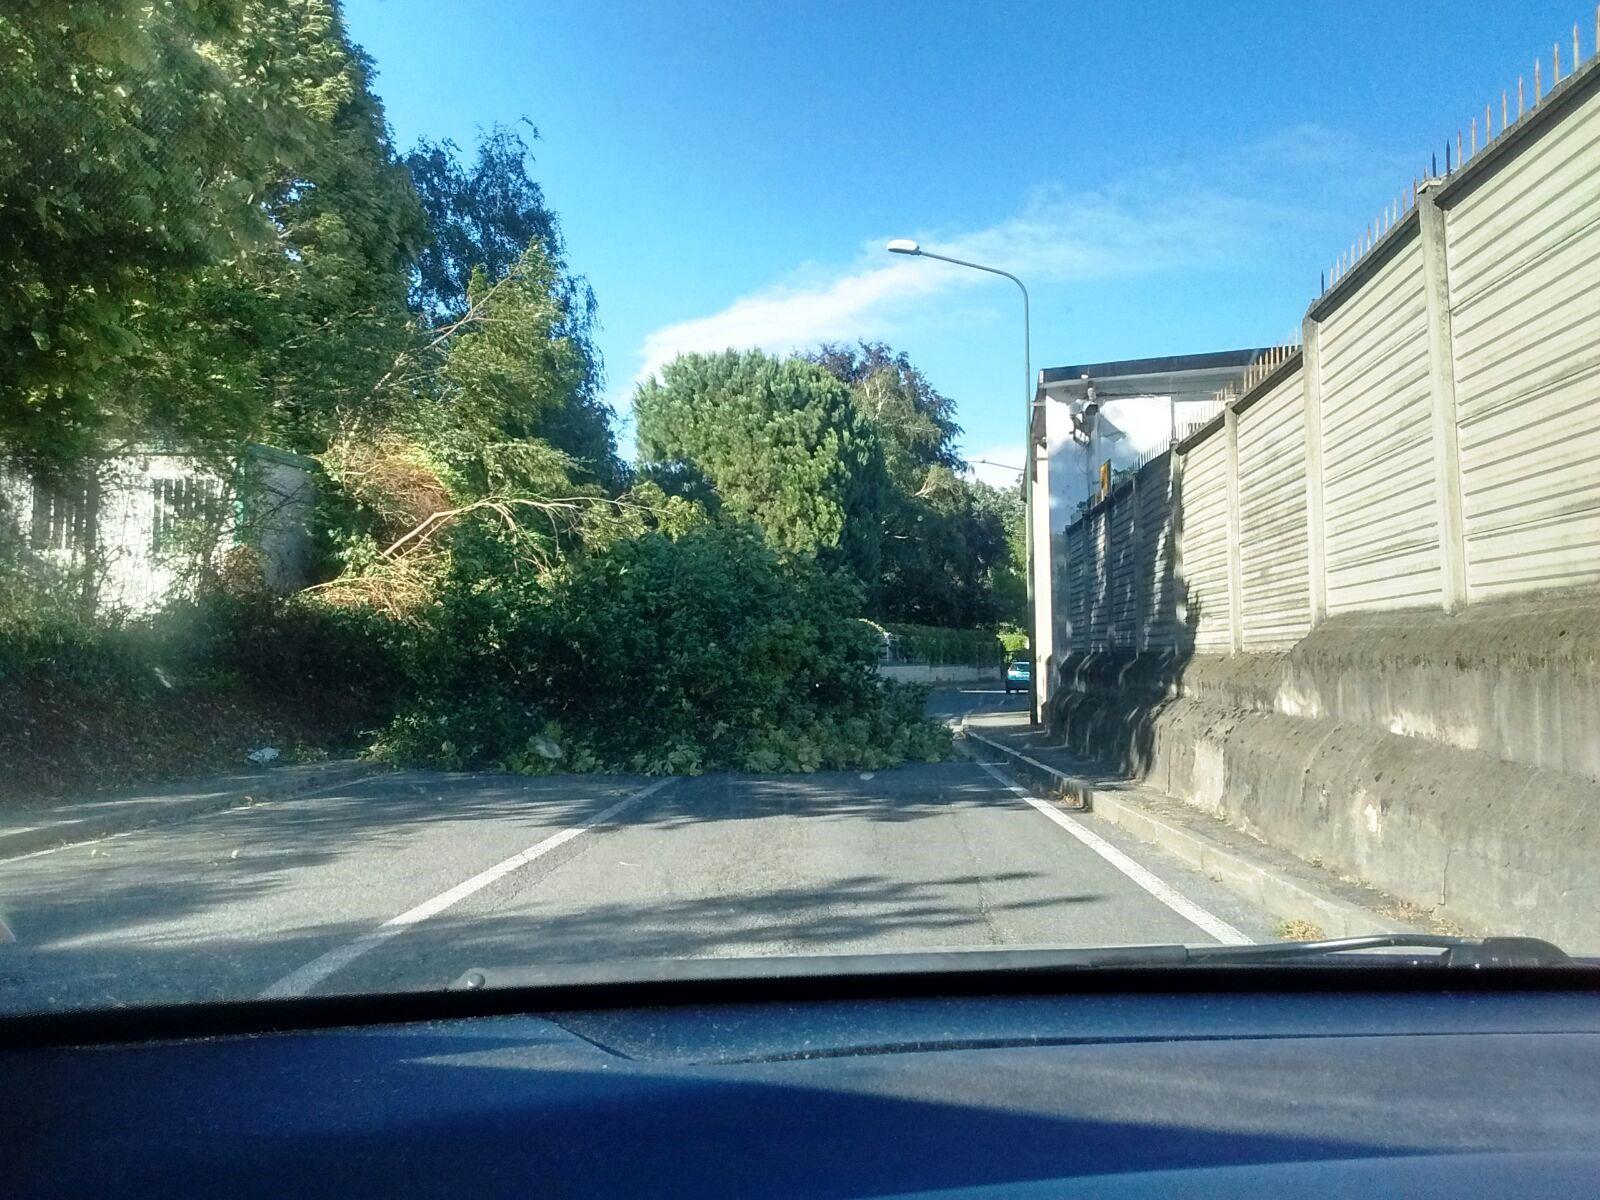 albero abbattuto